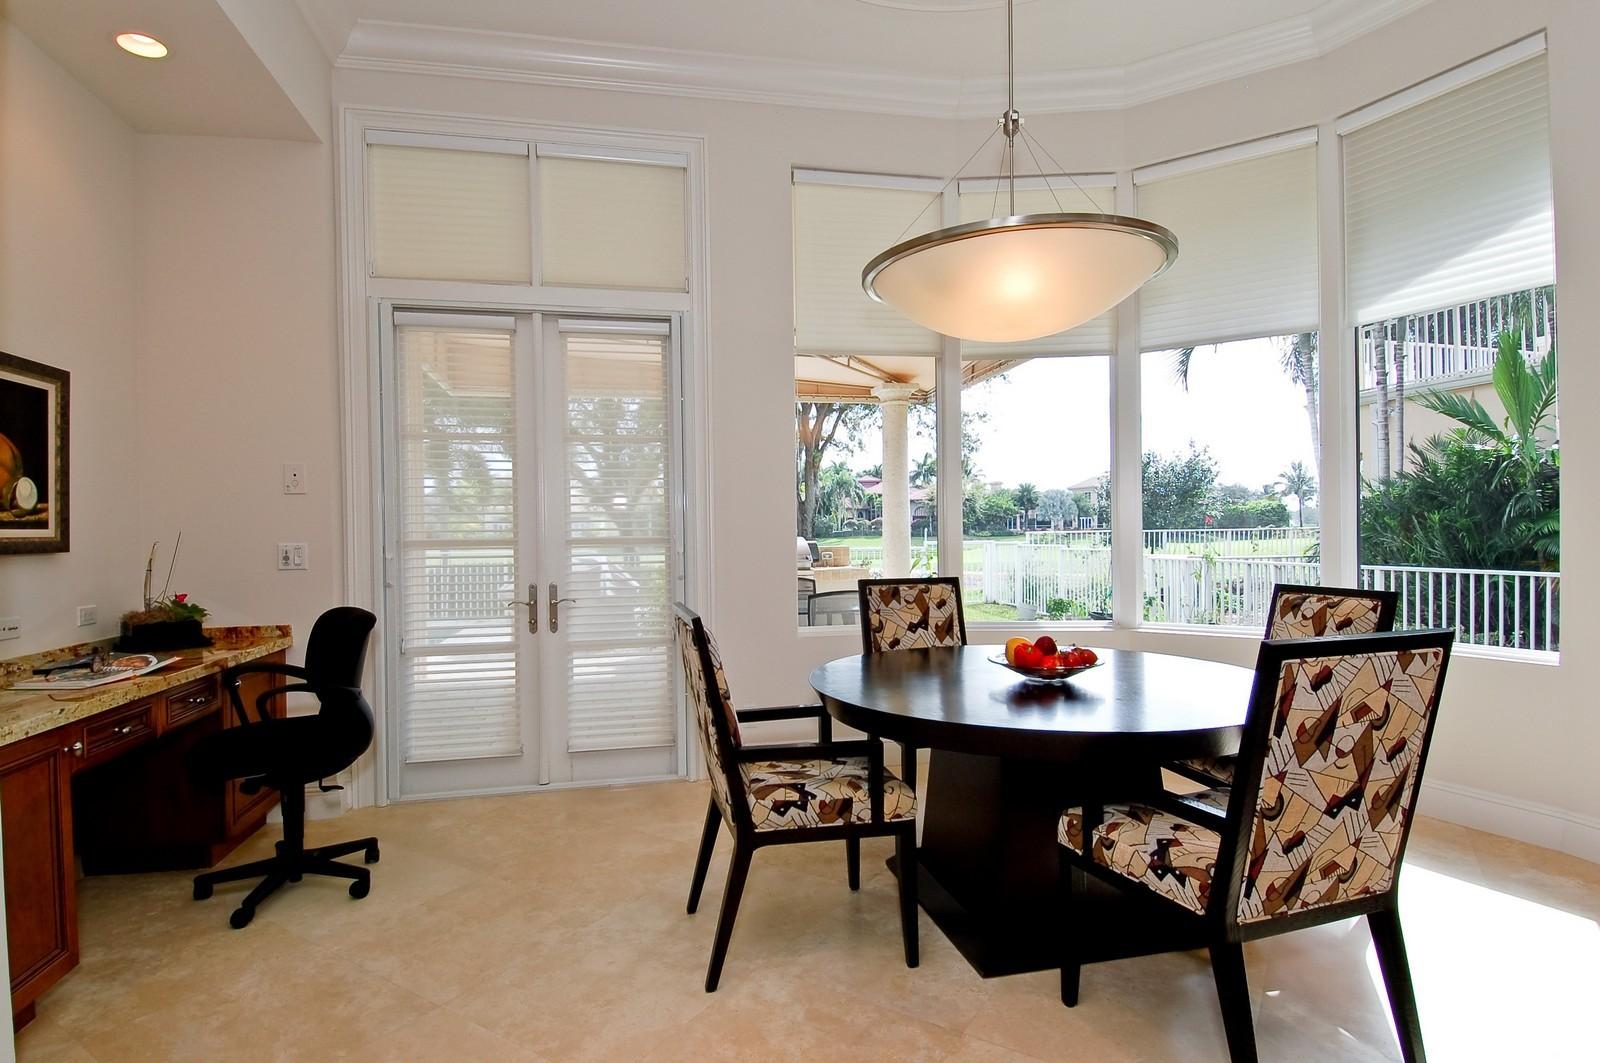 Real Estate Photography - 7478 Valencia Dr, Boca Raton, FL, 33433 - Breakfast Area